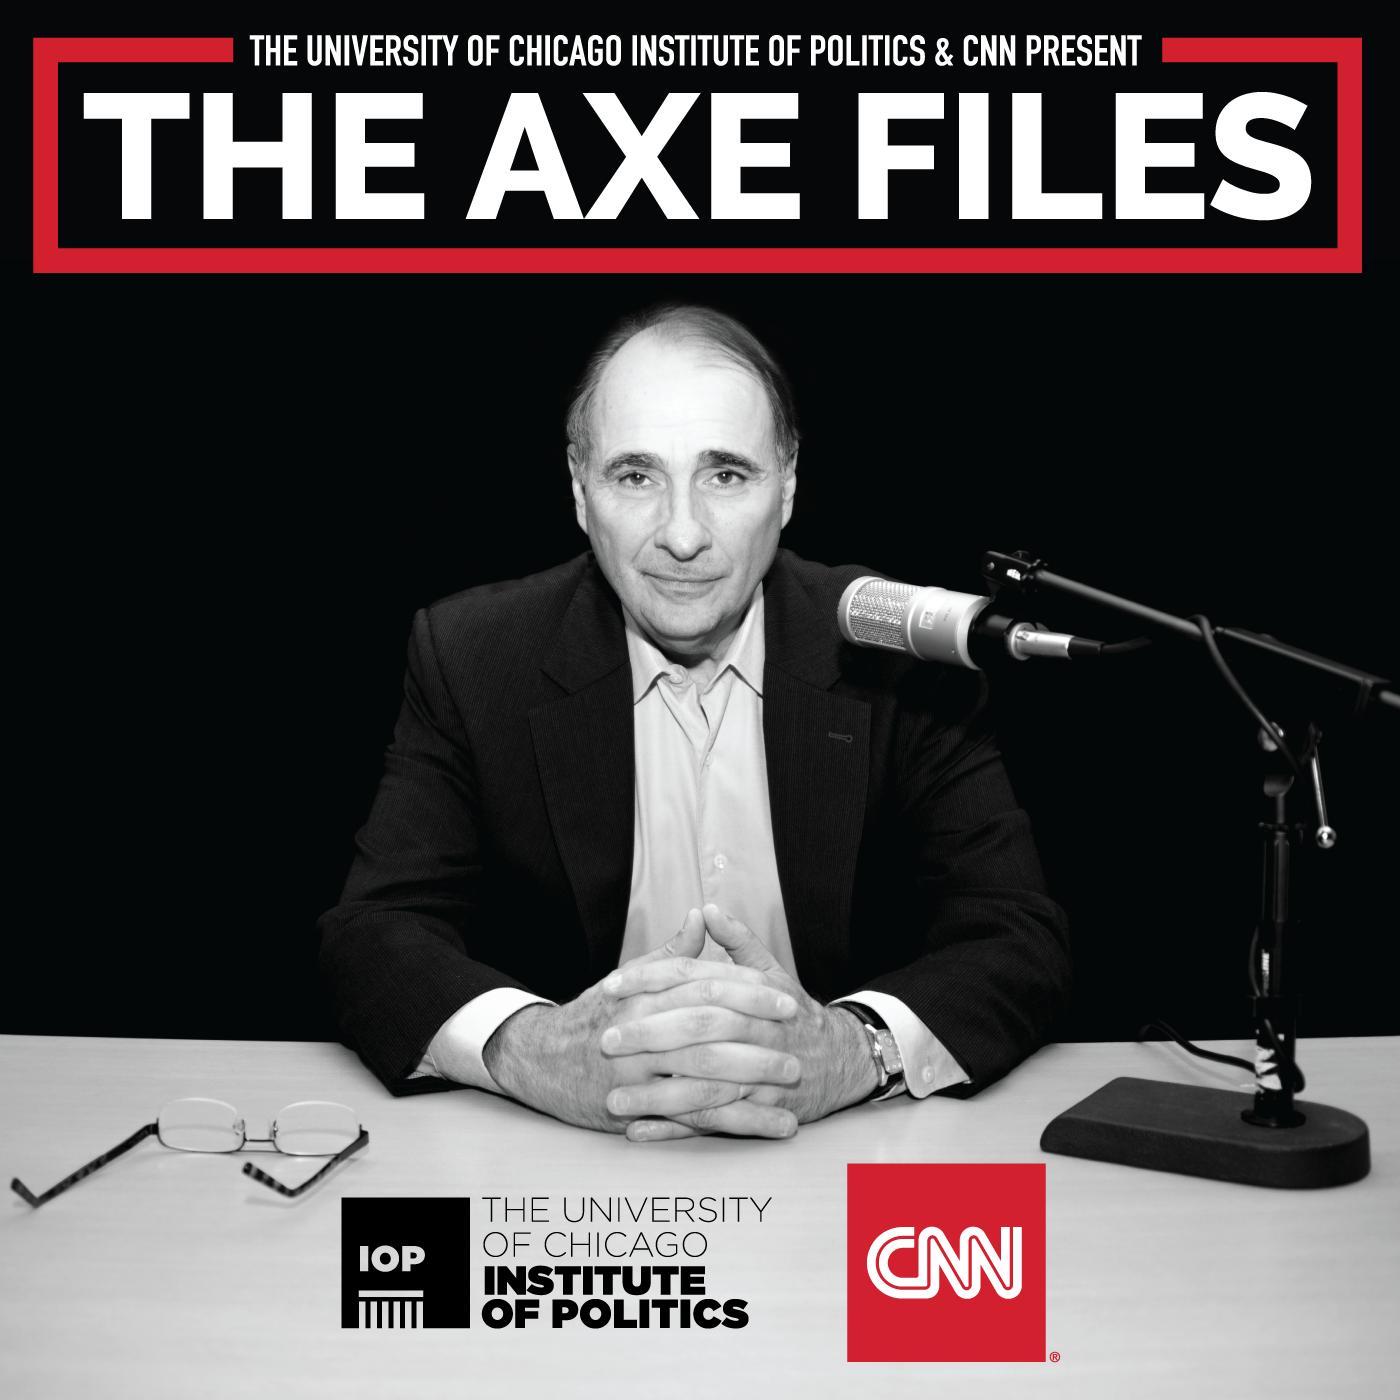 The Axe Files with David Axelrod